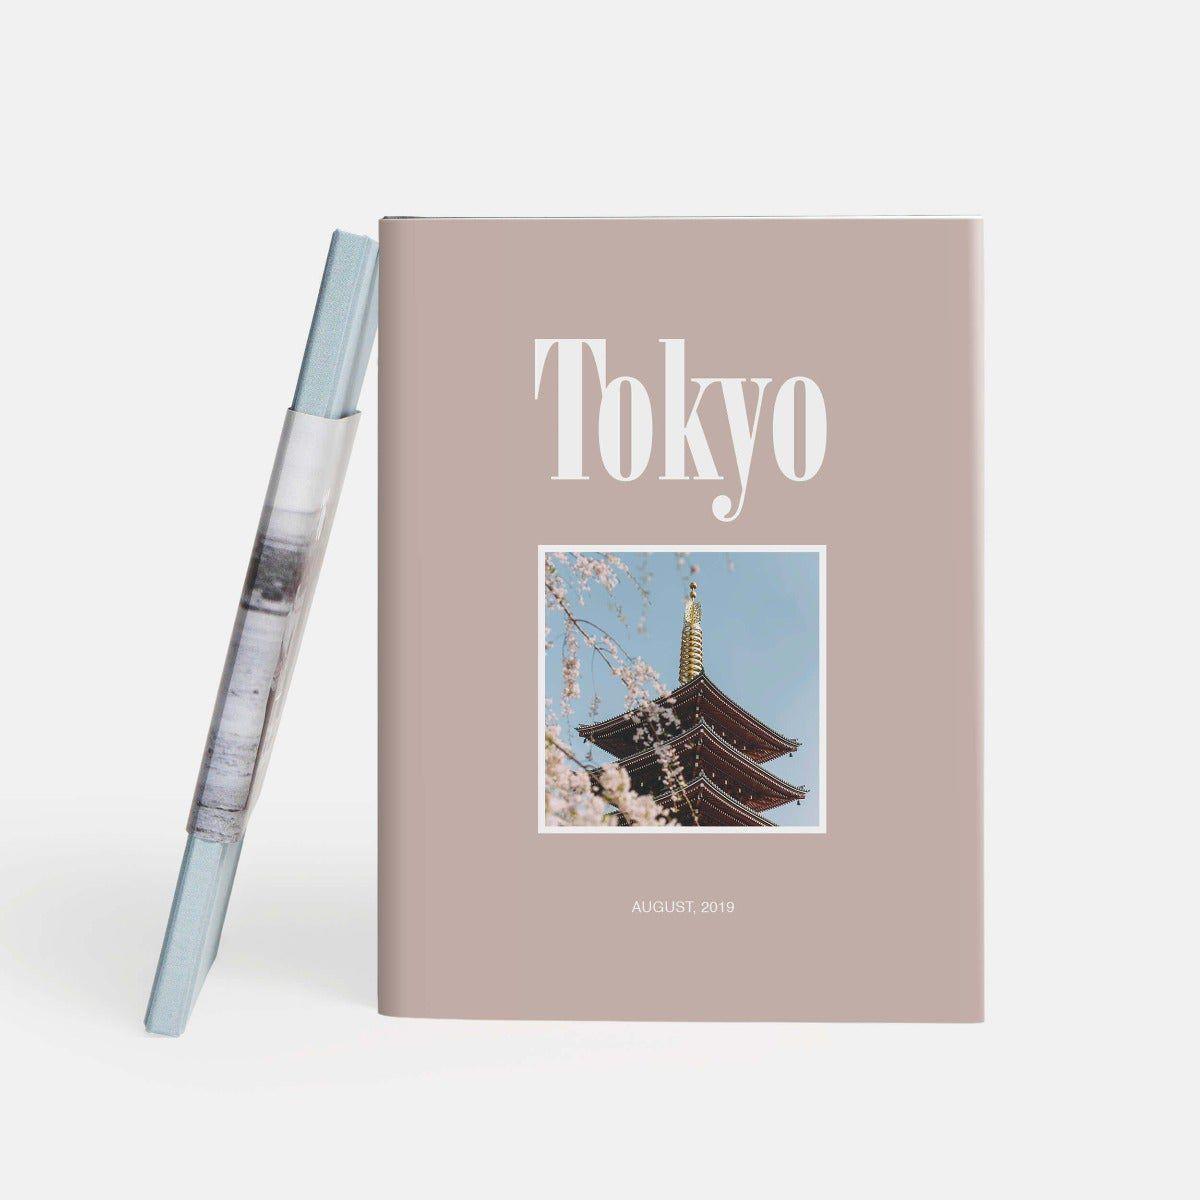 Artifact Uprising Custom Hardcover Travel Photo Book